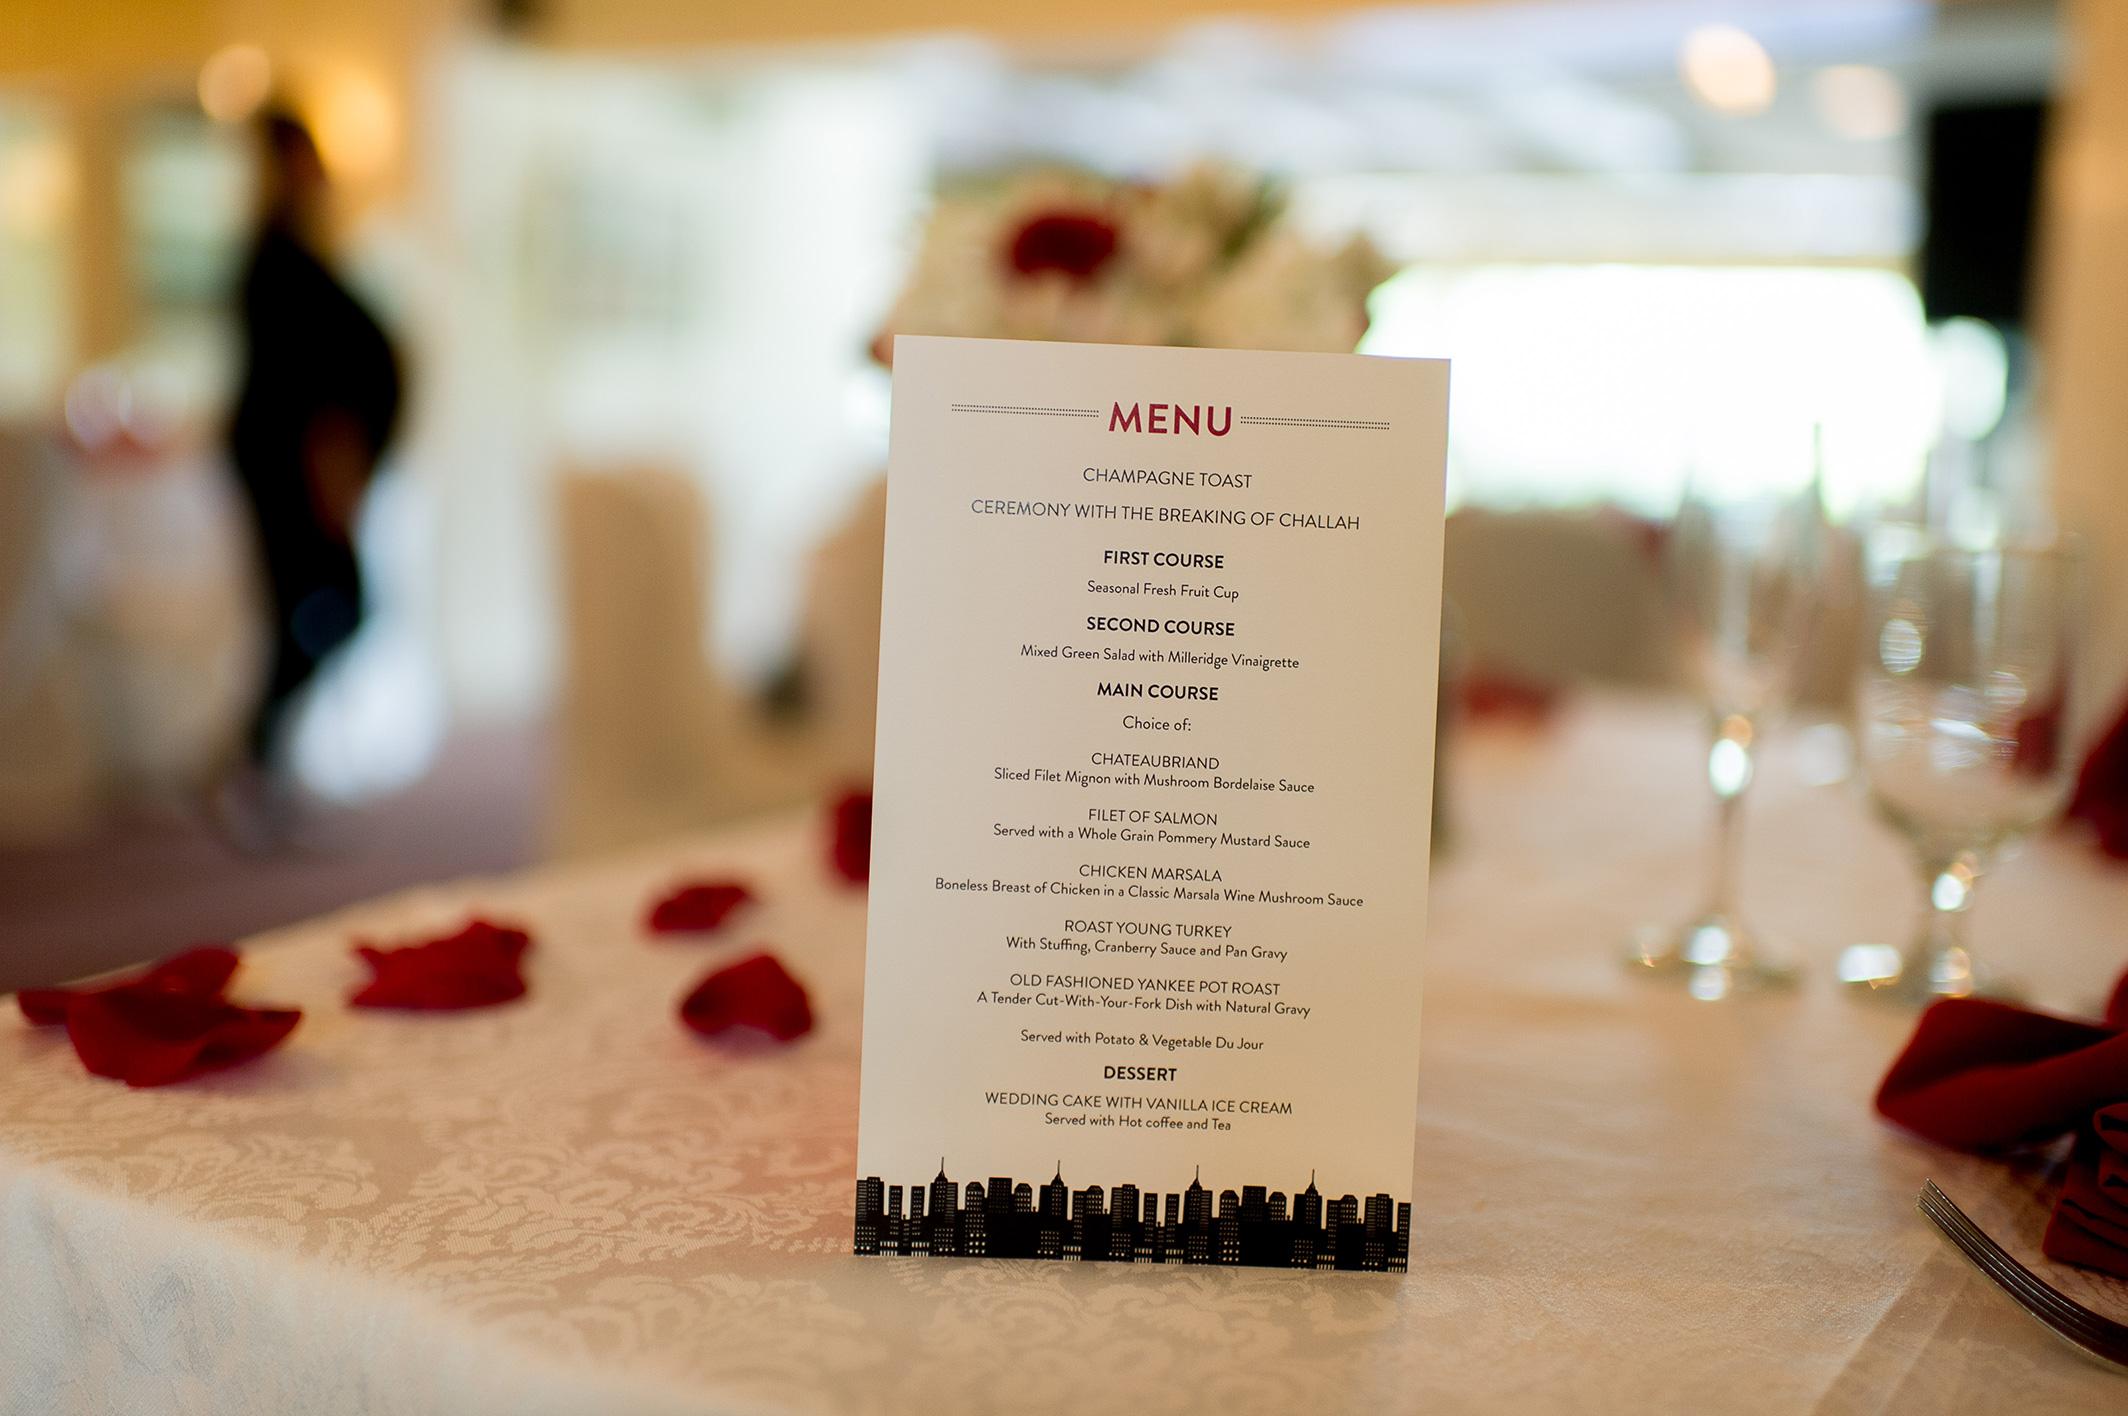 eventdesign_wedding_image20